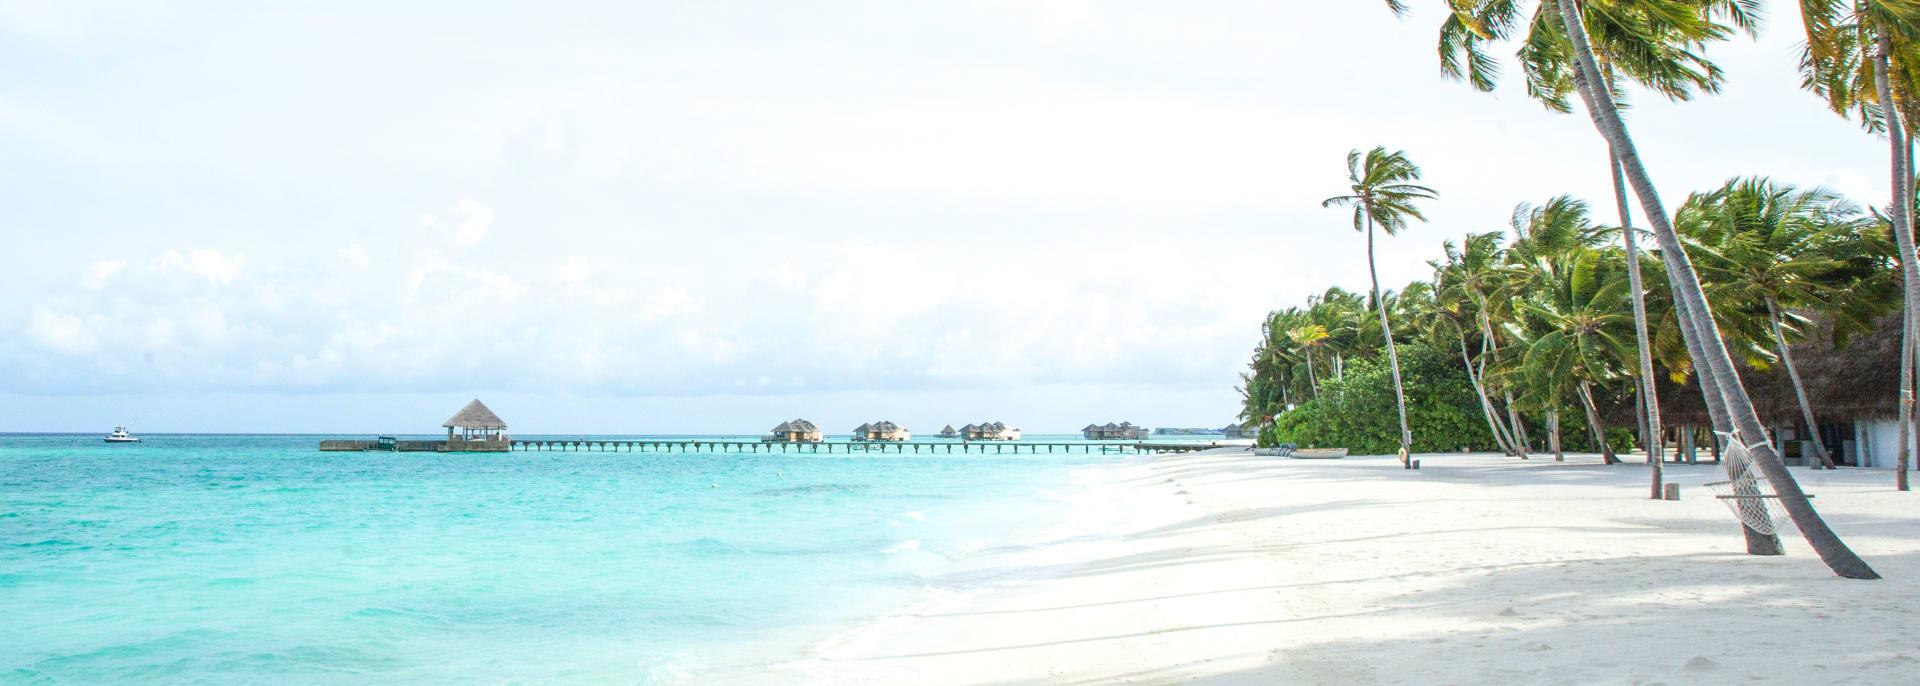 Baa atoll, Malediven